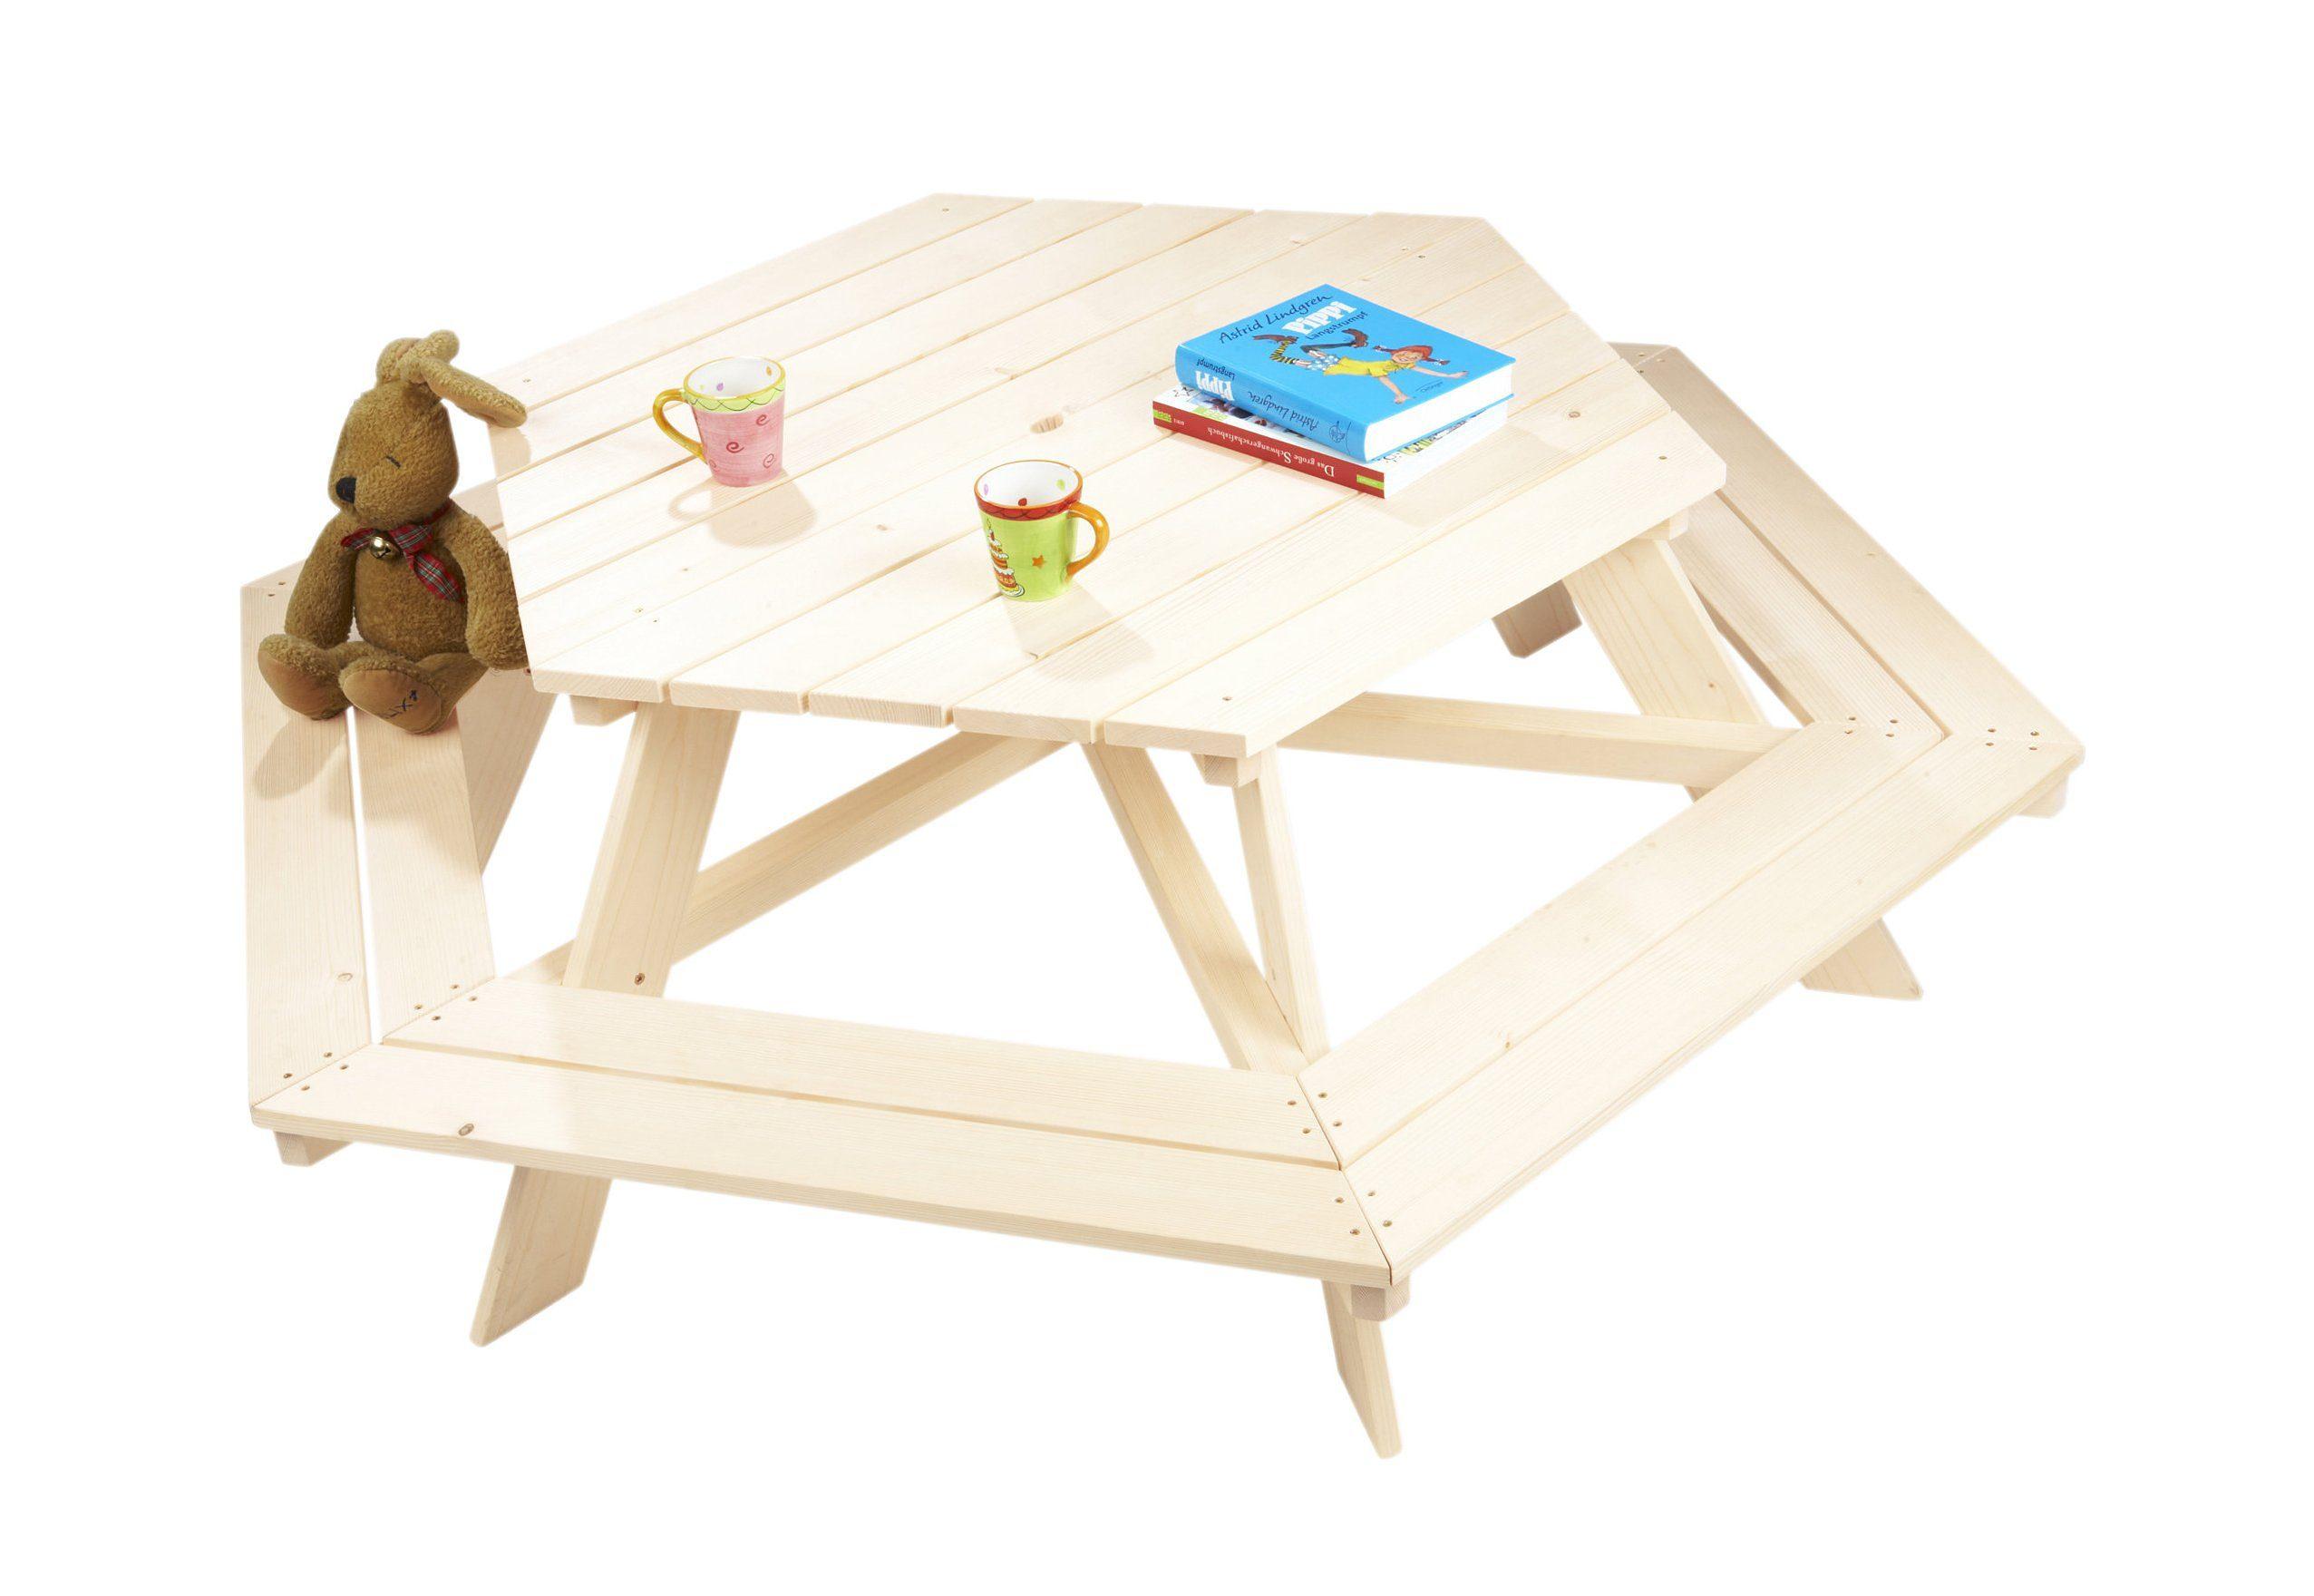 Kinder Picknick Tafel : Exit aksent zand water en picknicktafel deluxe